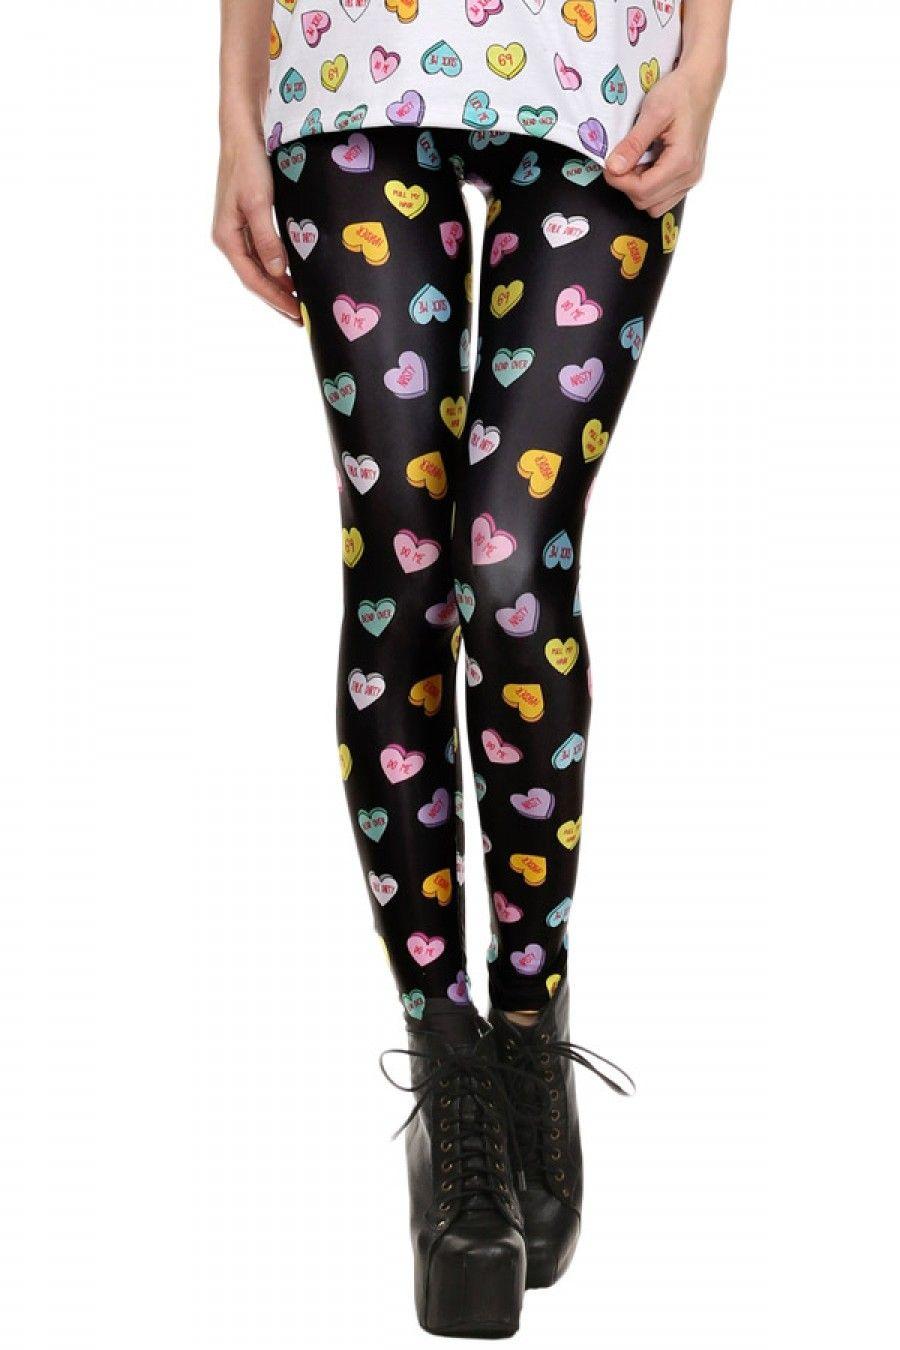 women_s-candy-heart-leggings.jpg (900×1350)